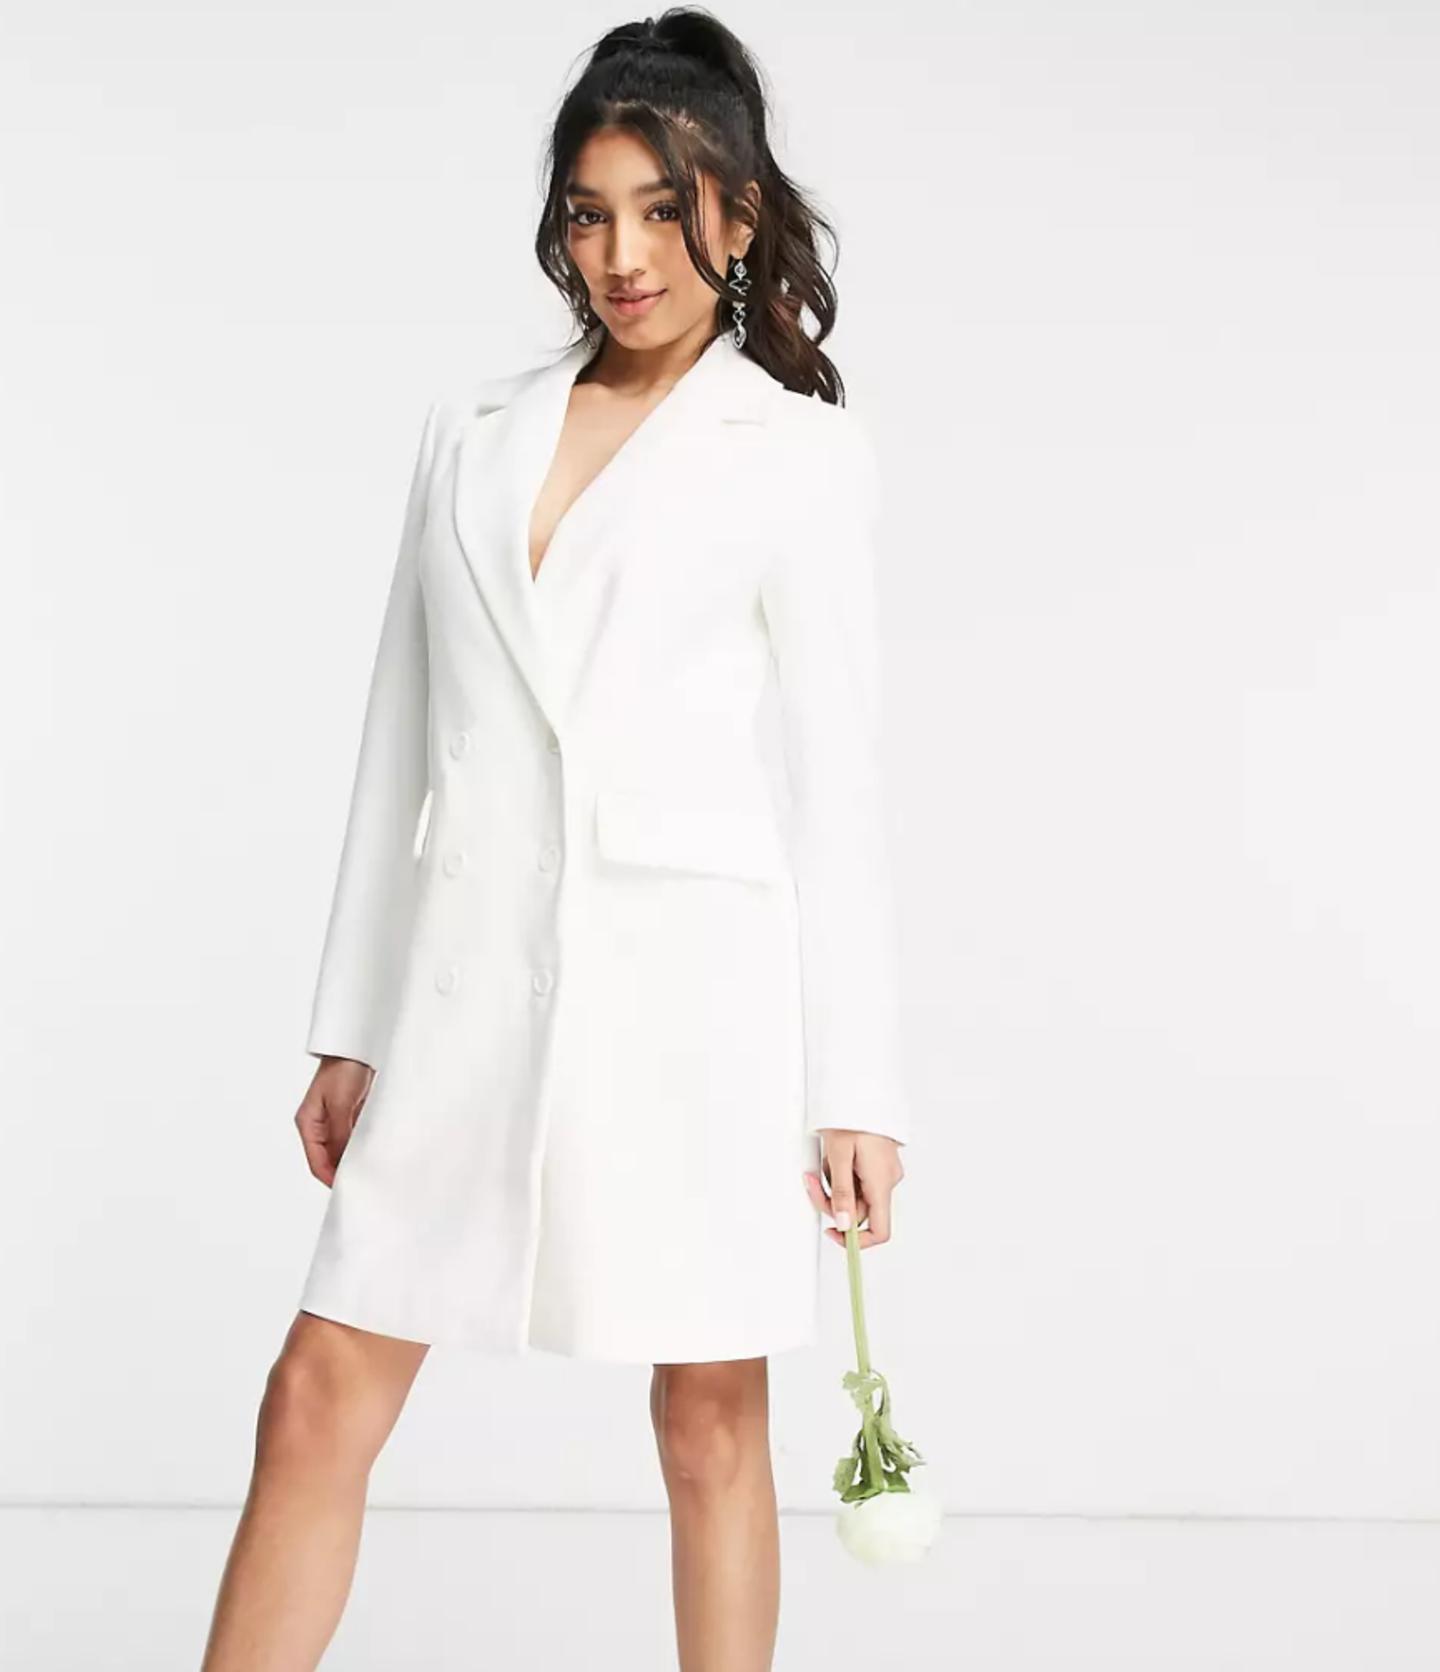 Eon Model präsentiert ein Brautkleid.